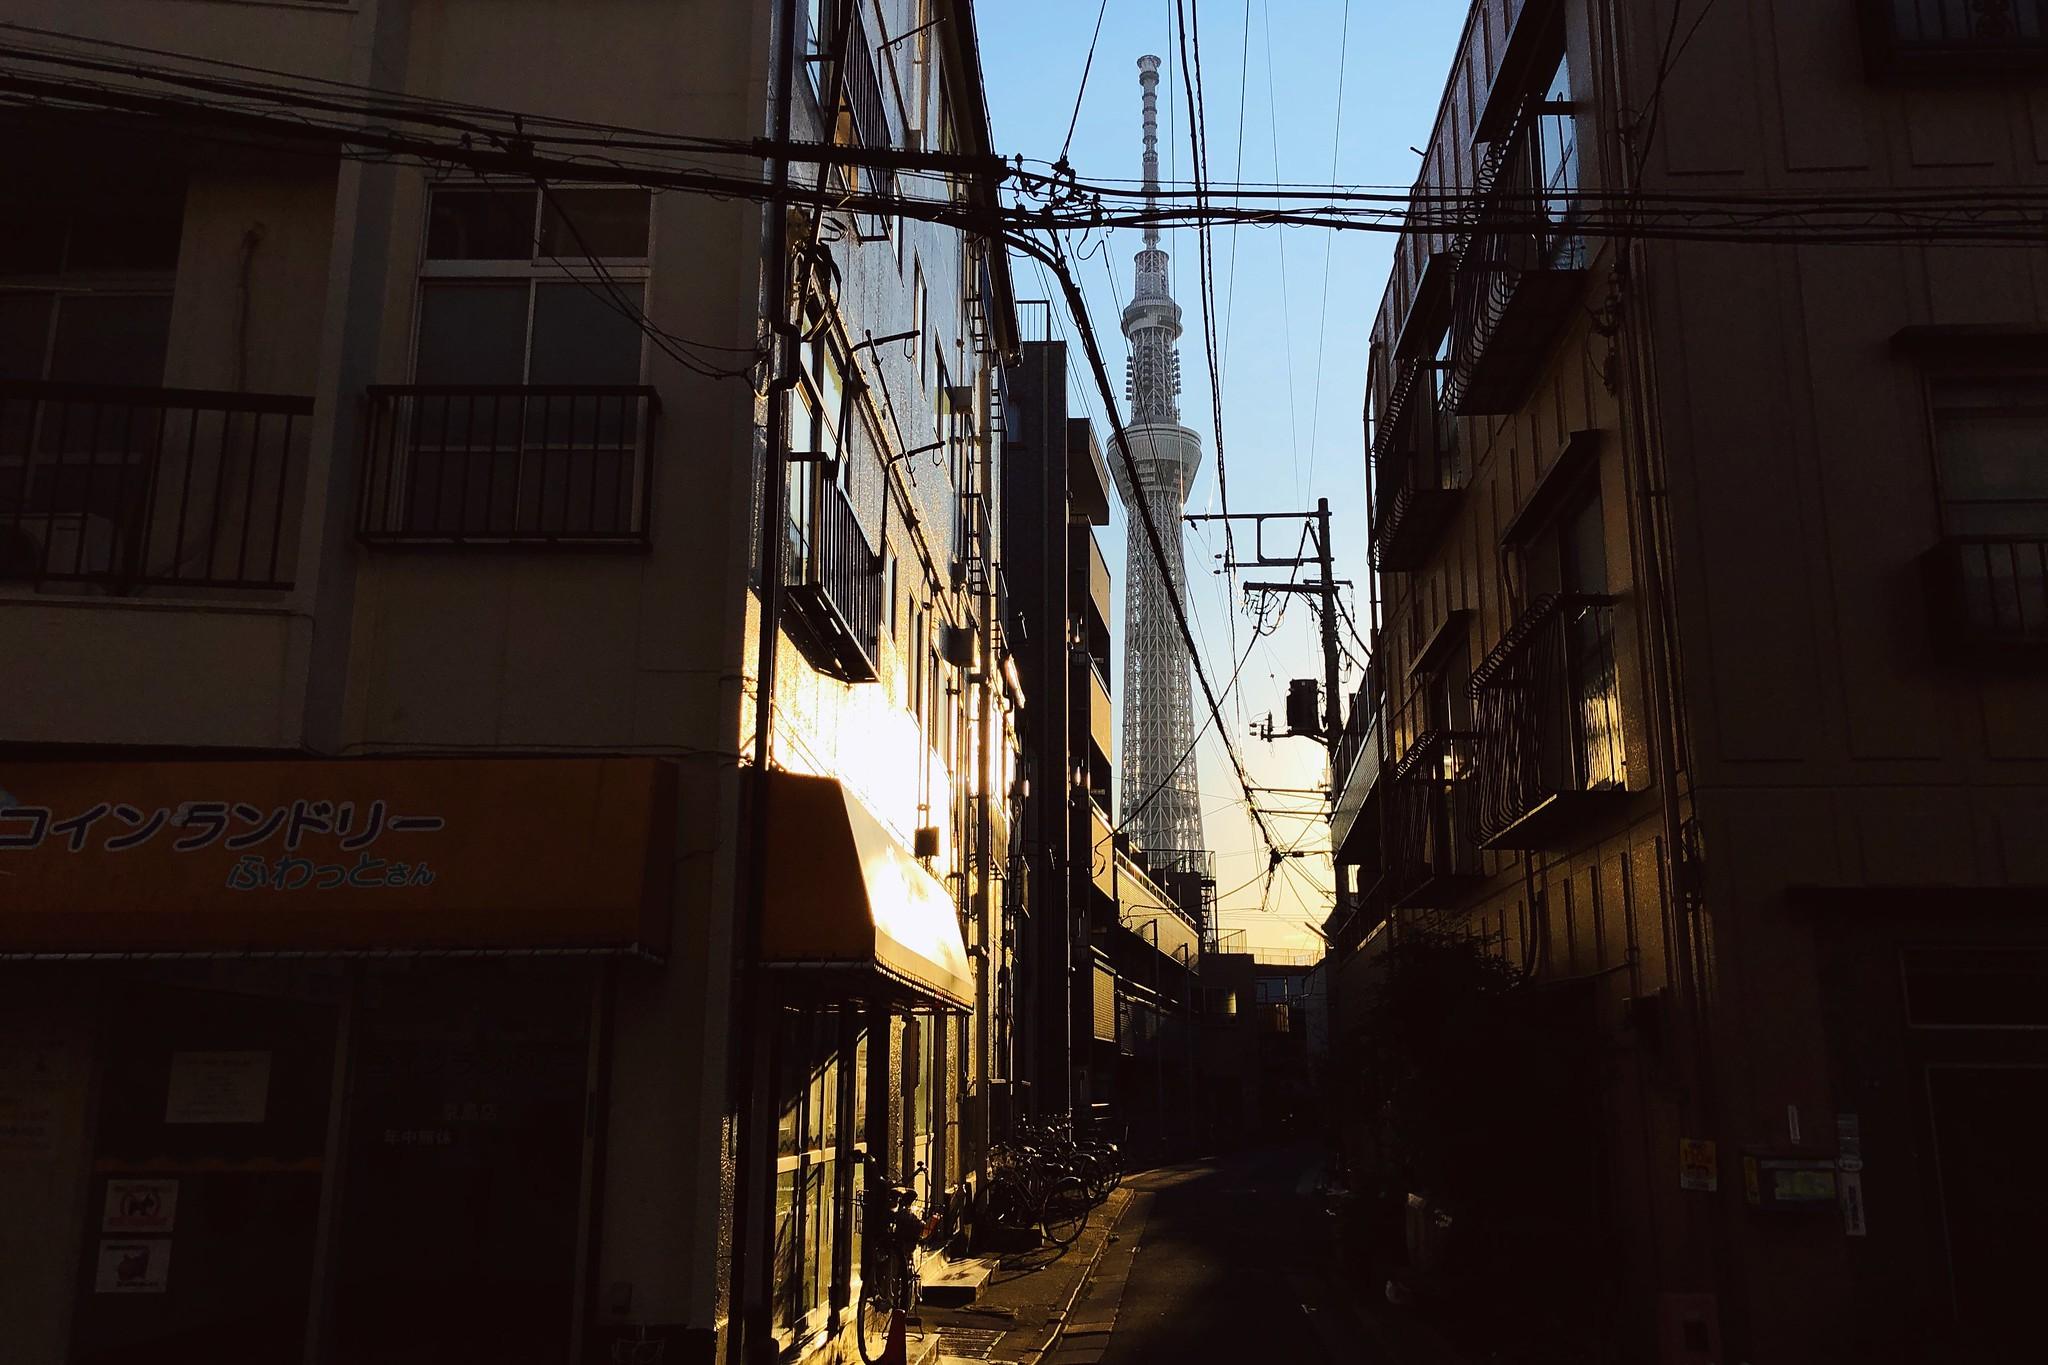 Tokyo Skytree - 2020 #shotoniphone #iPhoneX #Halide  #RNIFilms #FujiAstia100F #Tokyo #Japan